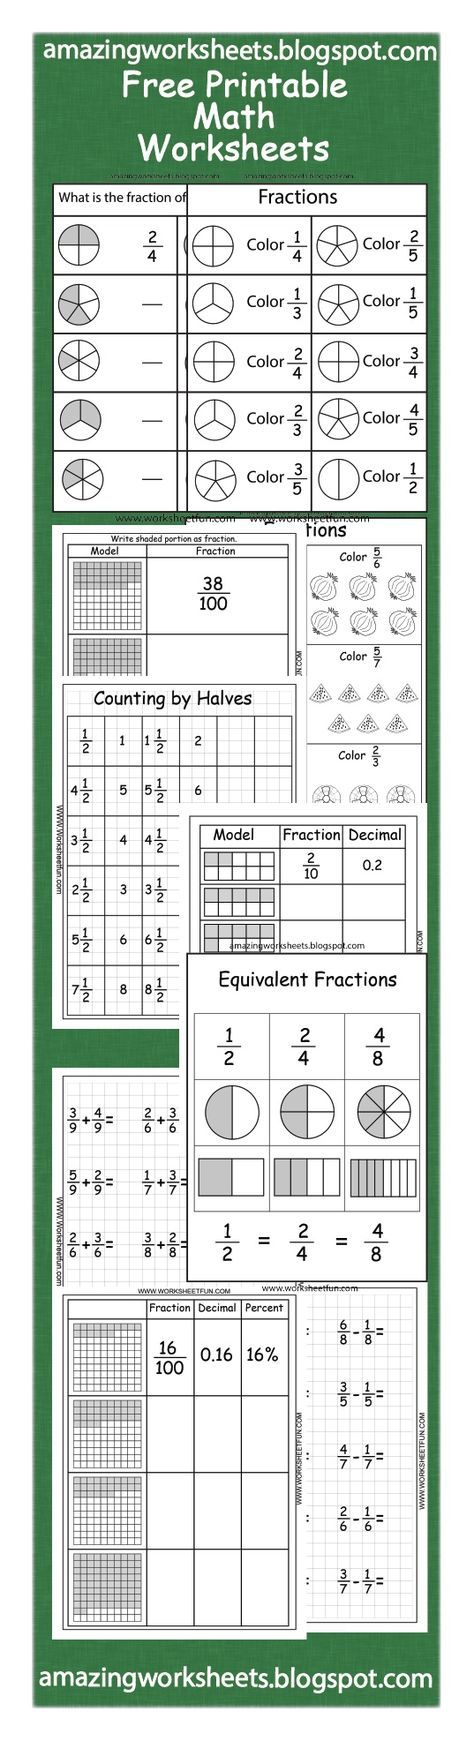 Free Printable Fractions Worksheets Httpworksheetfun